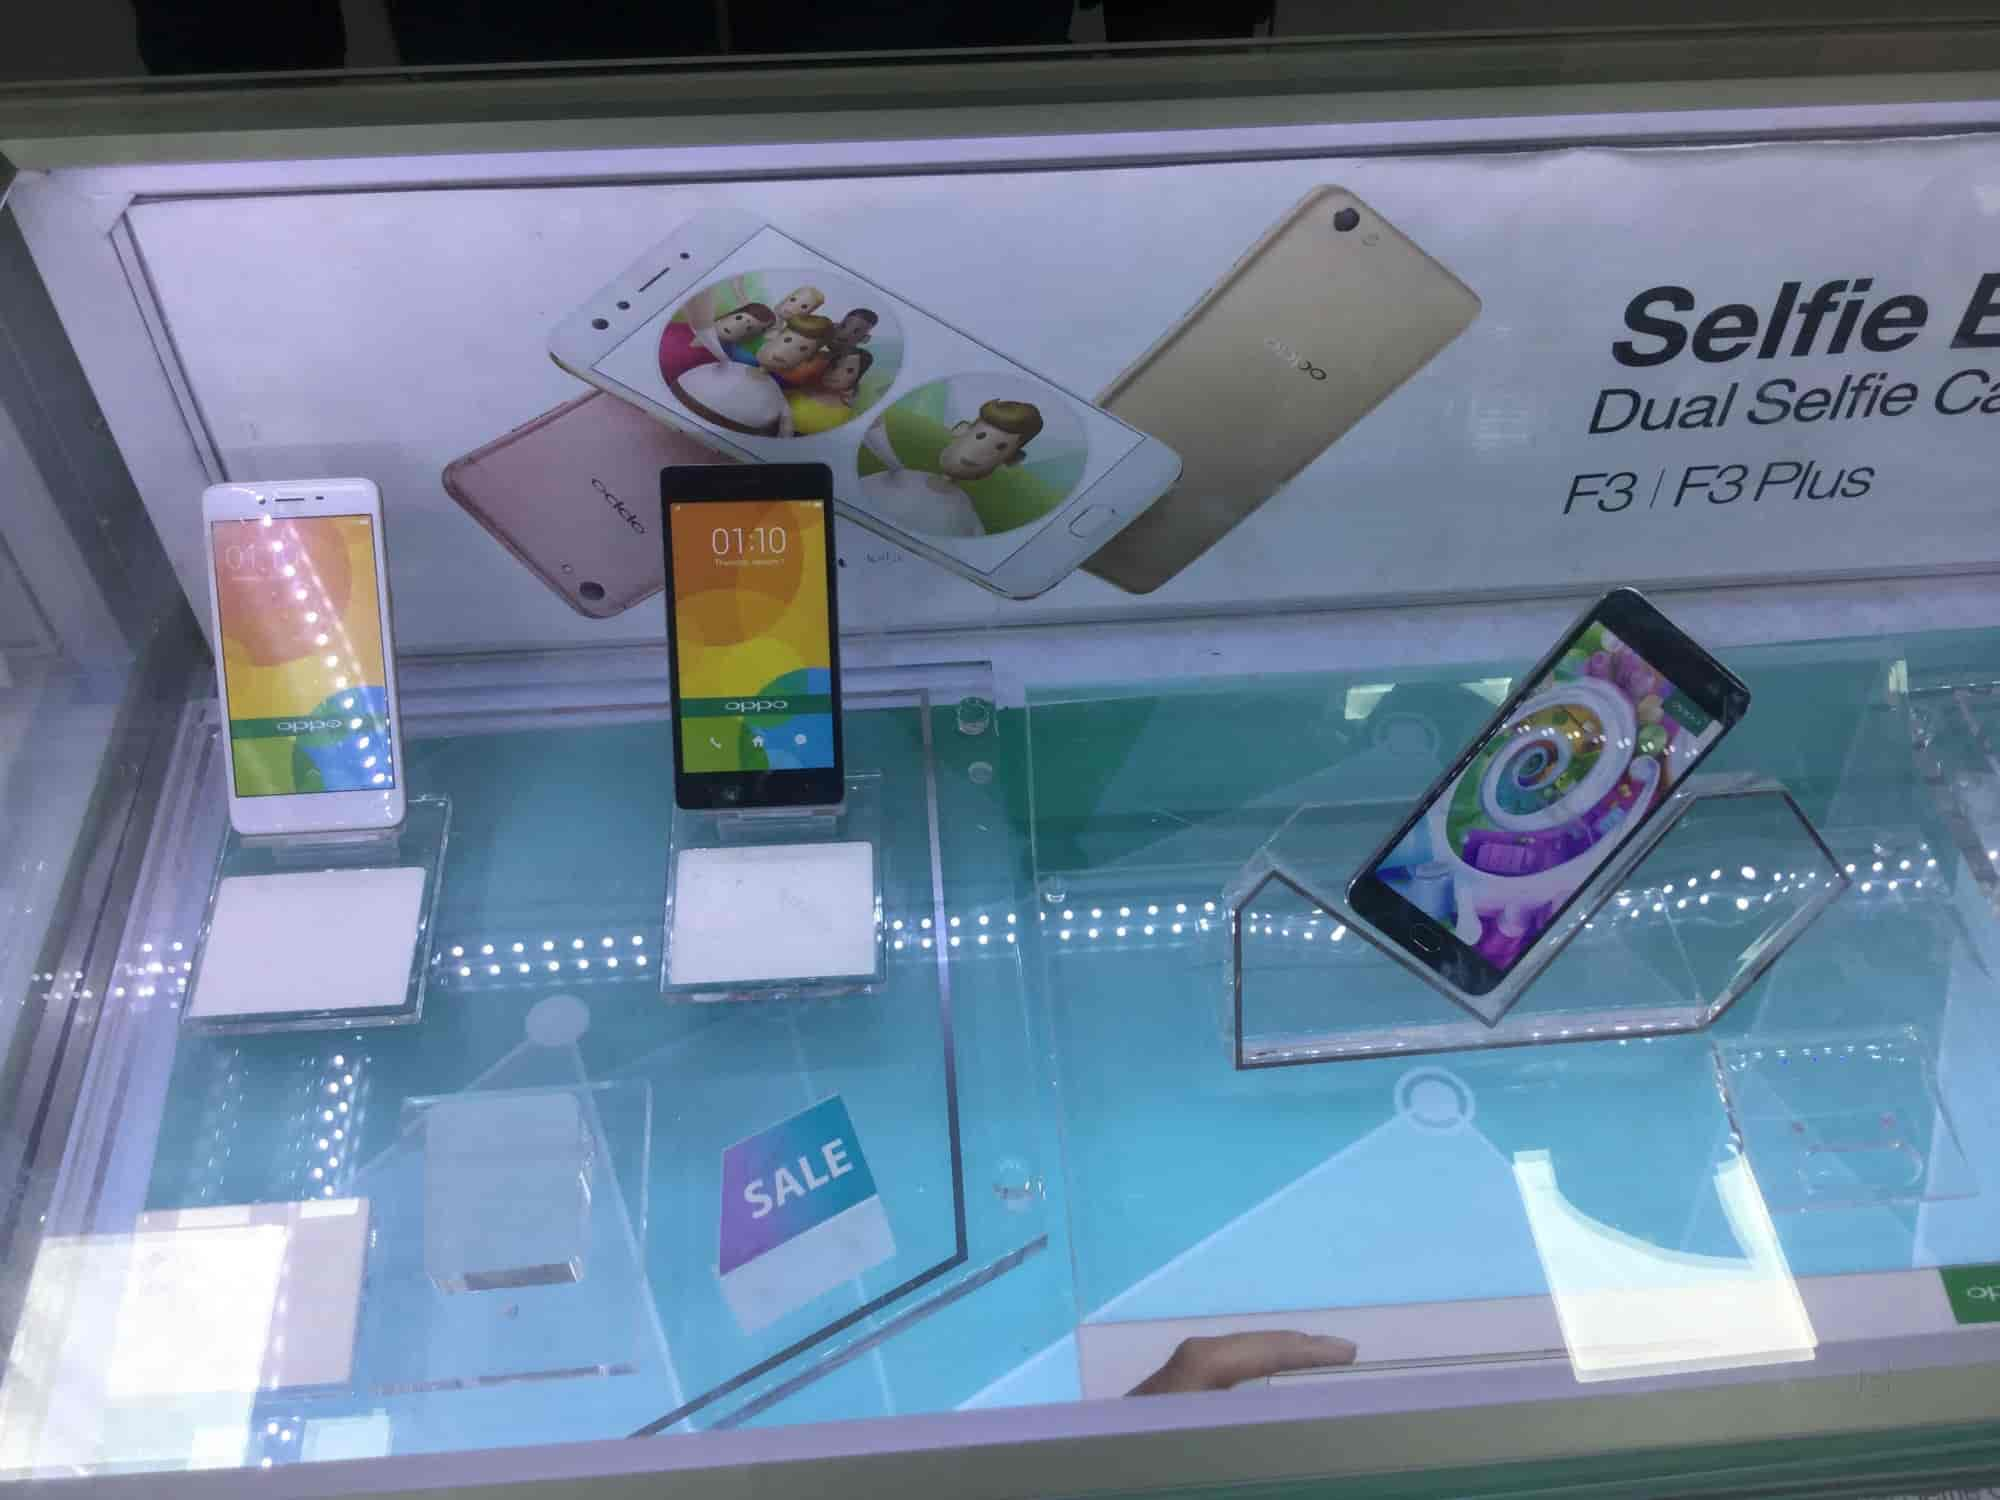 STAR Mobiles Samadanapuram Mobile Phone Dealers in Tirunelveli Justdial